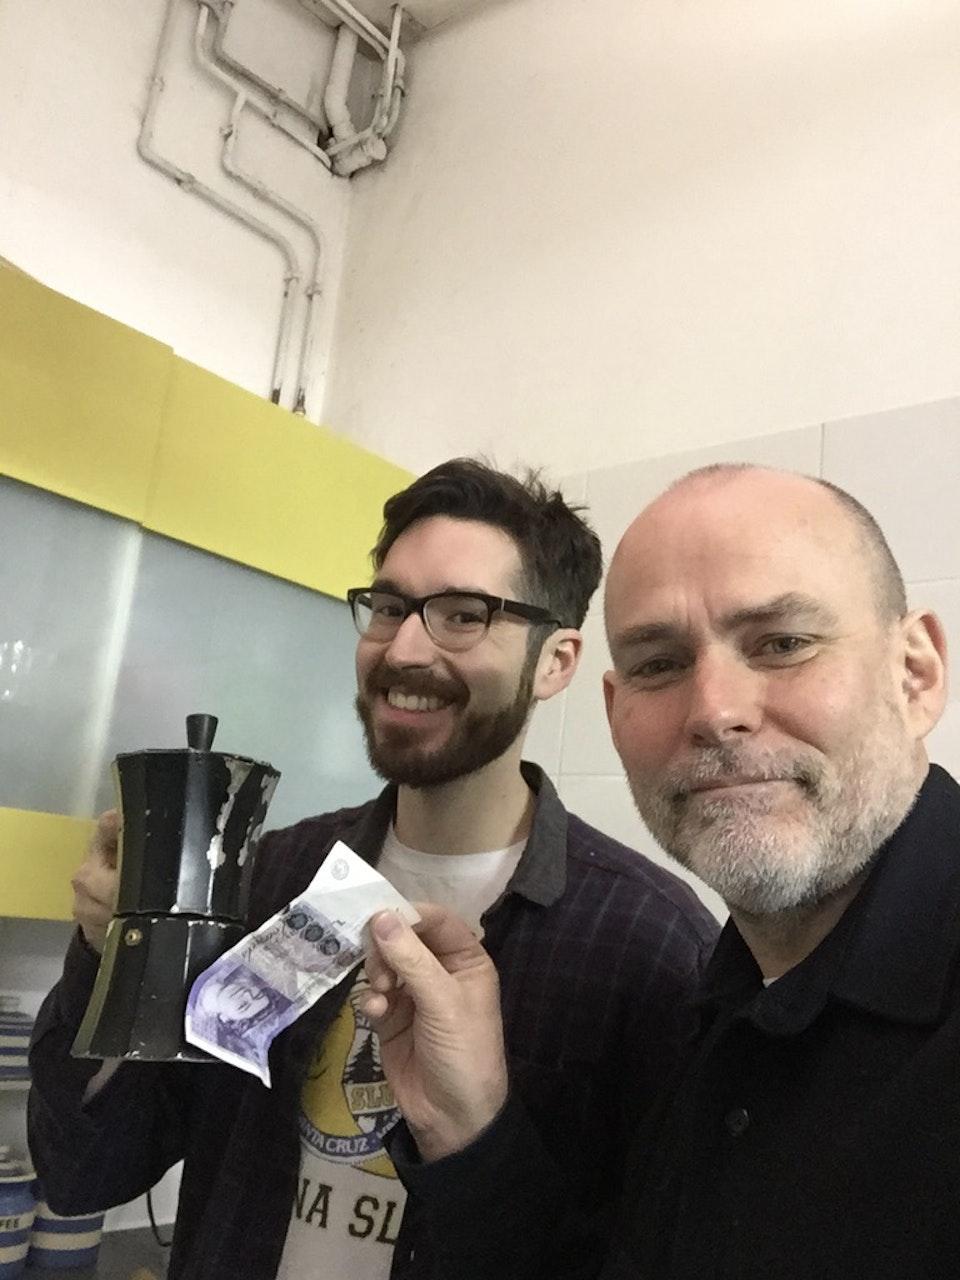 Cross Street Studio - Jackson - the Cross Street SM from Melbourne, charging DOP Simon Paul £20 for Coffee!